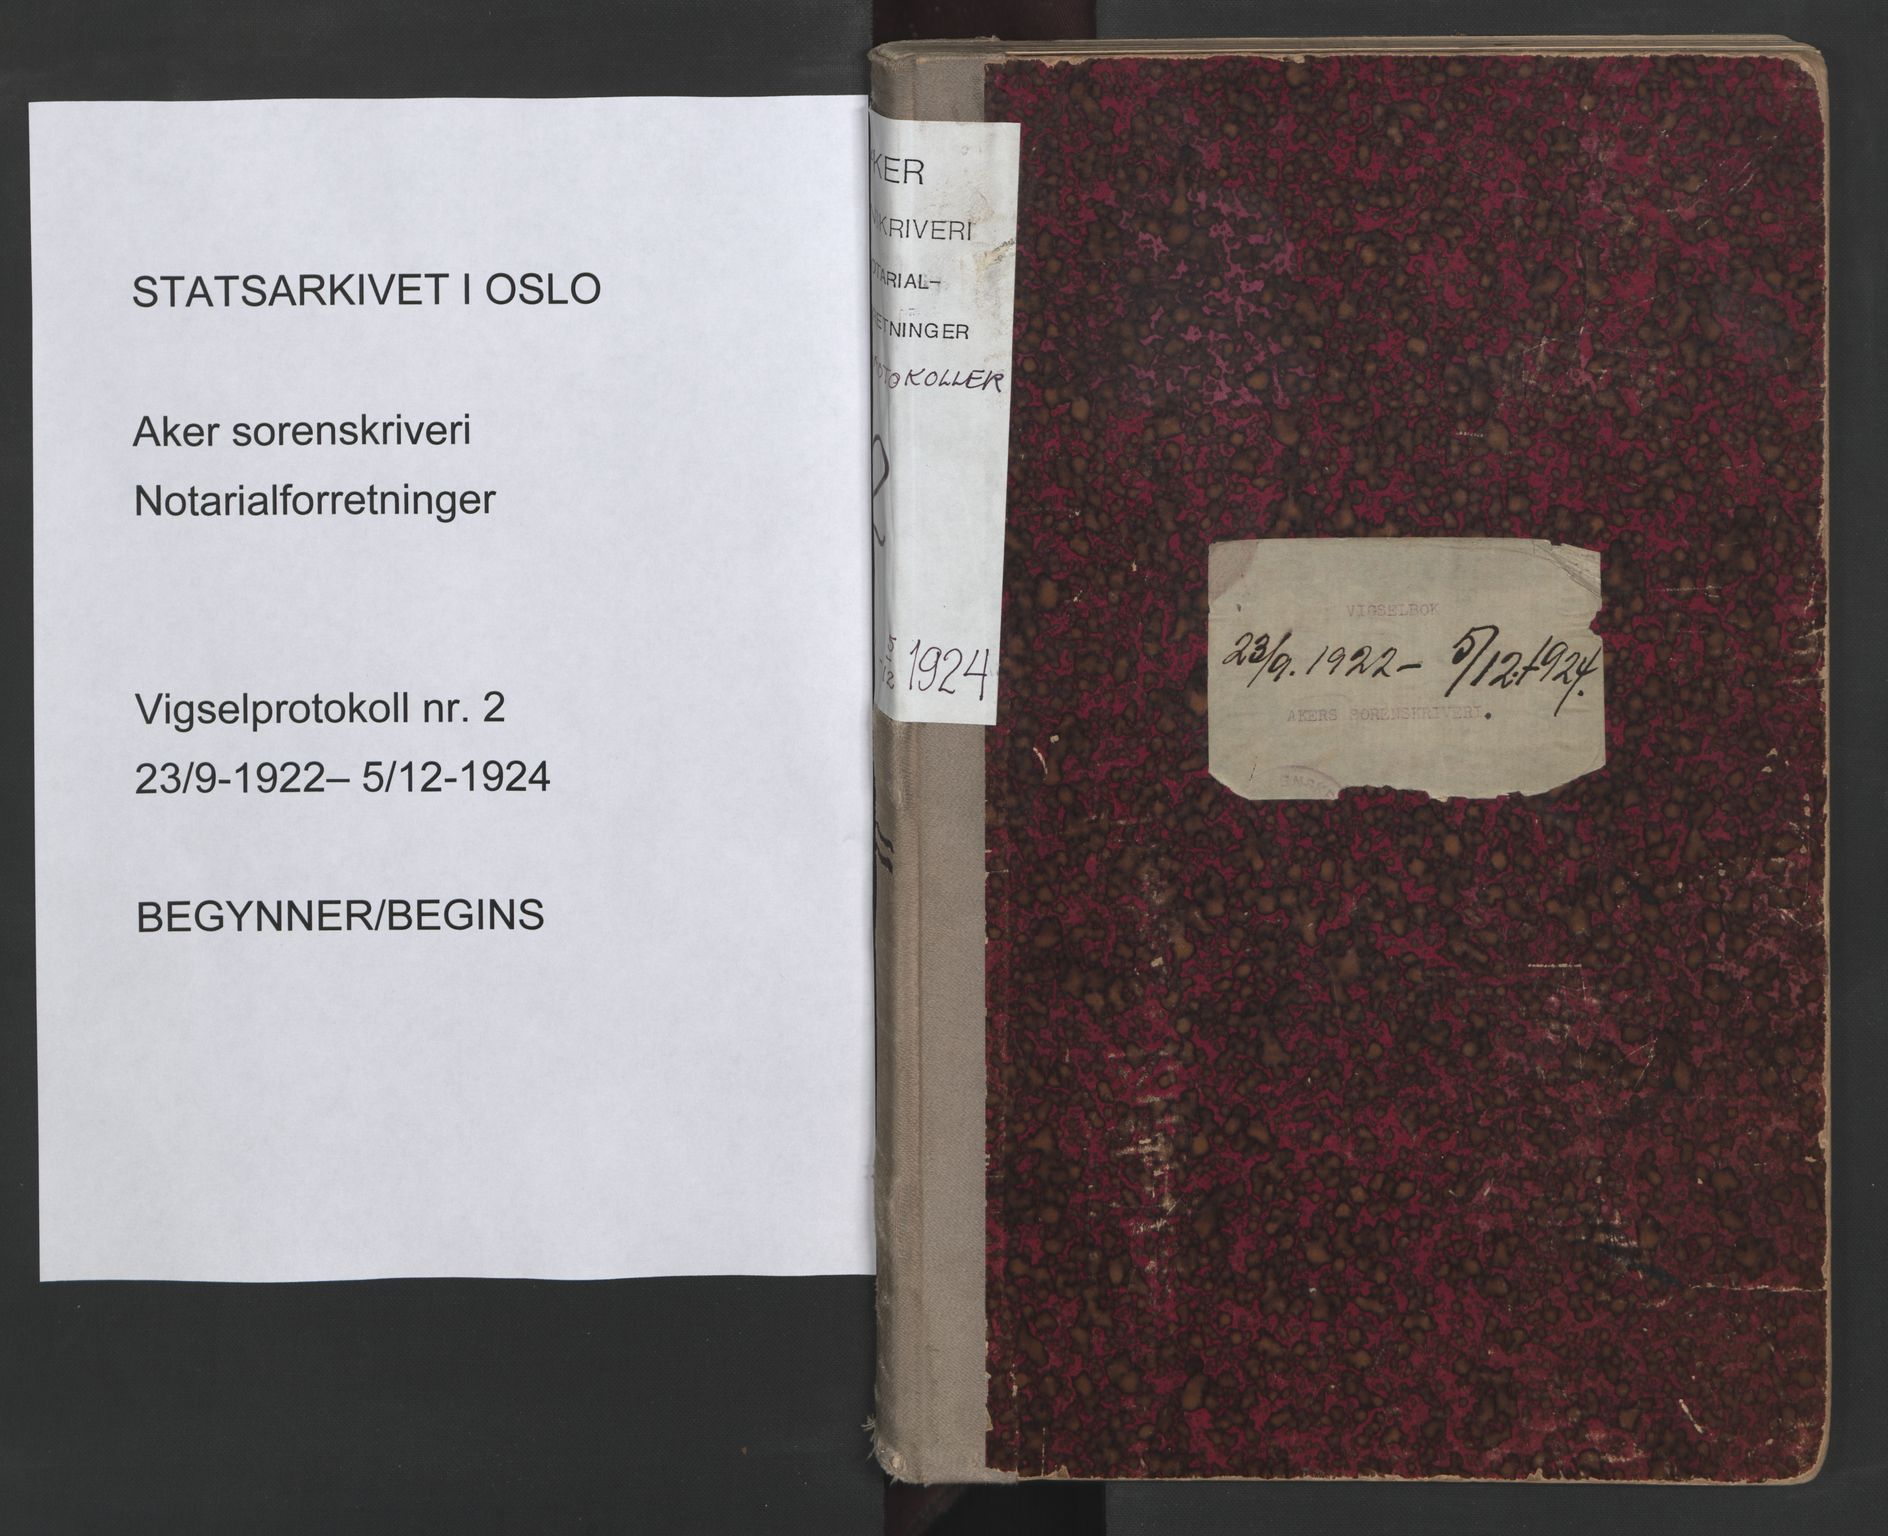 SAO, Aker sorenskriveri, L/Lc/Lcb/L0002: Vigselprotokoll, 1922-1924, s. upaginert